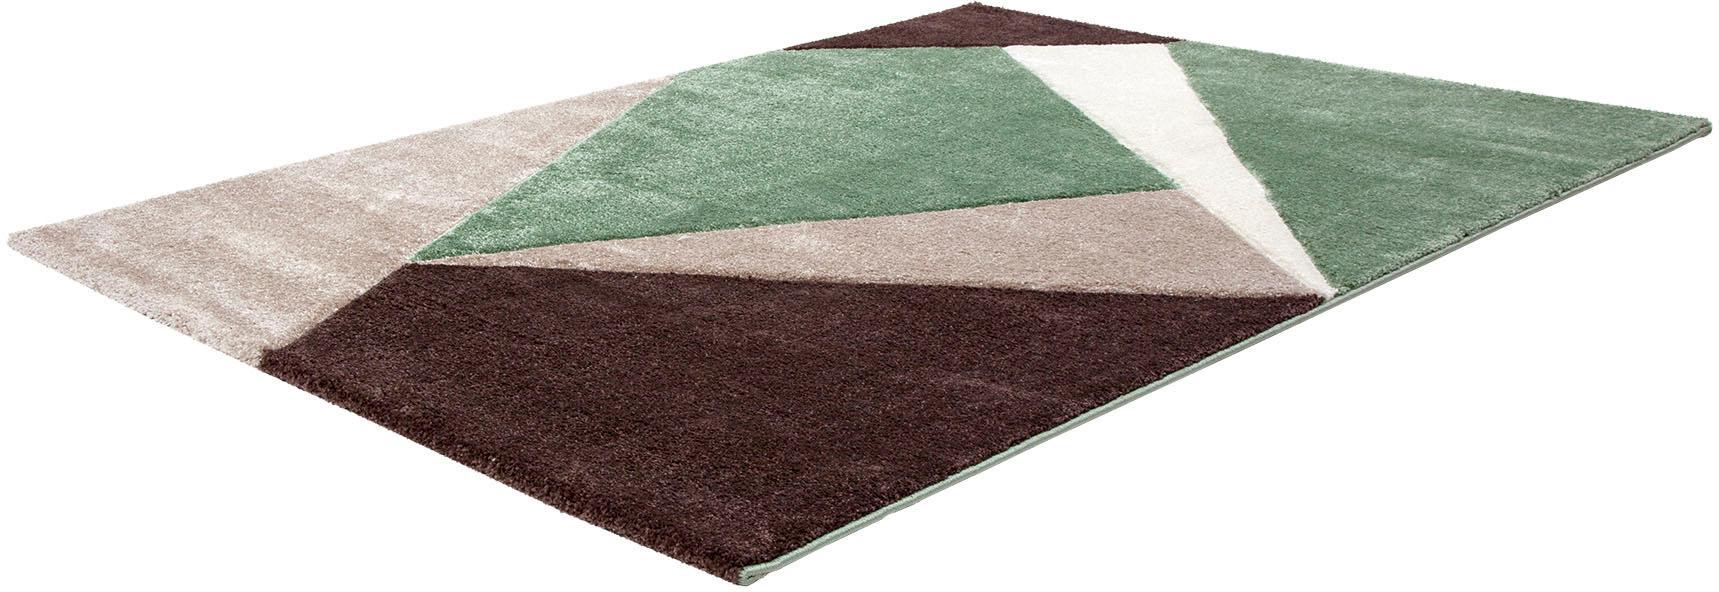 Teppich My Broadway 286 Obsession rechteckig Höhe 25 mm maschinell gewebt